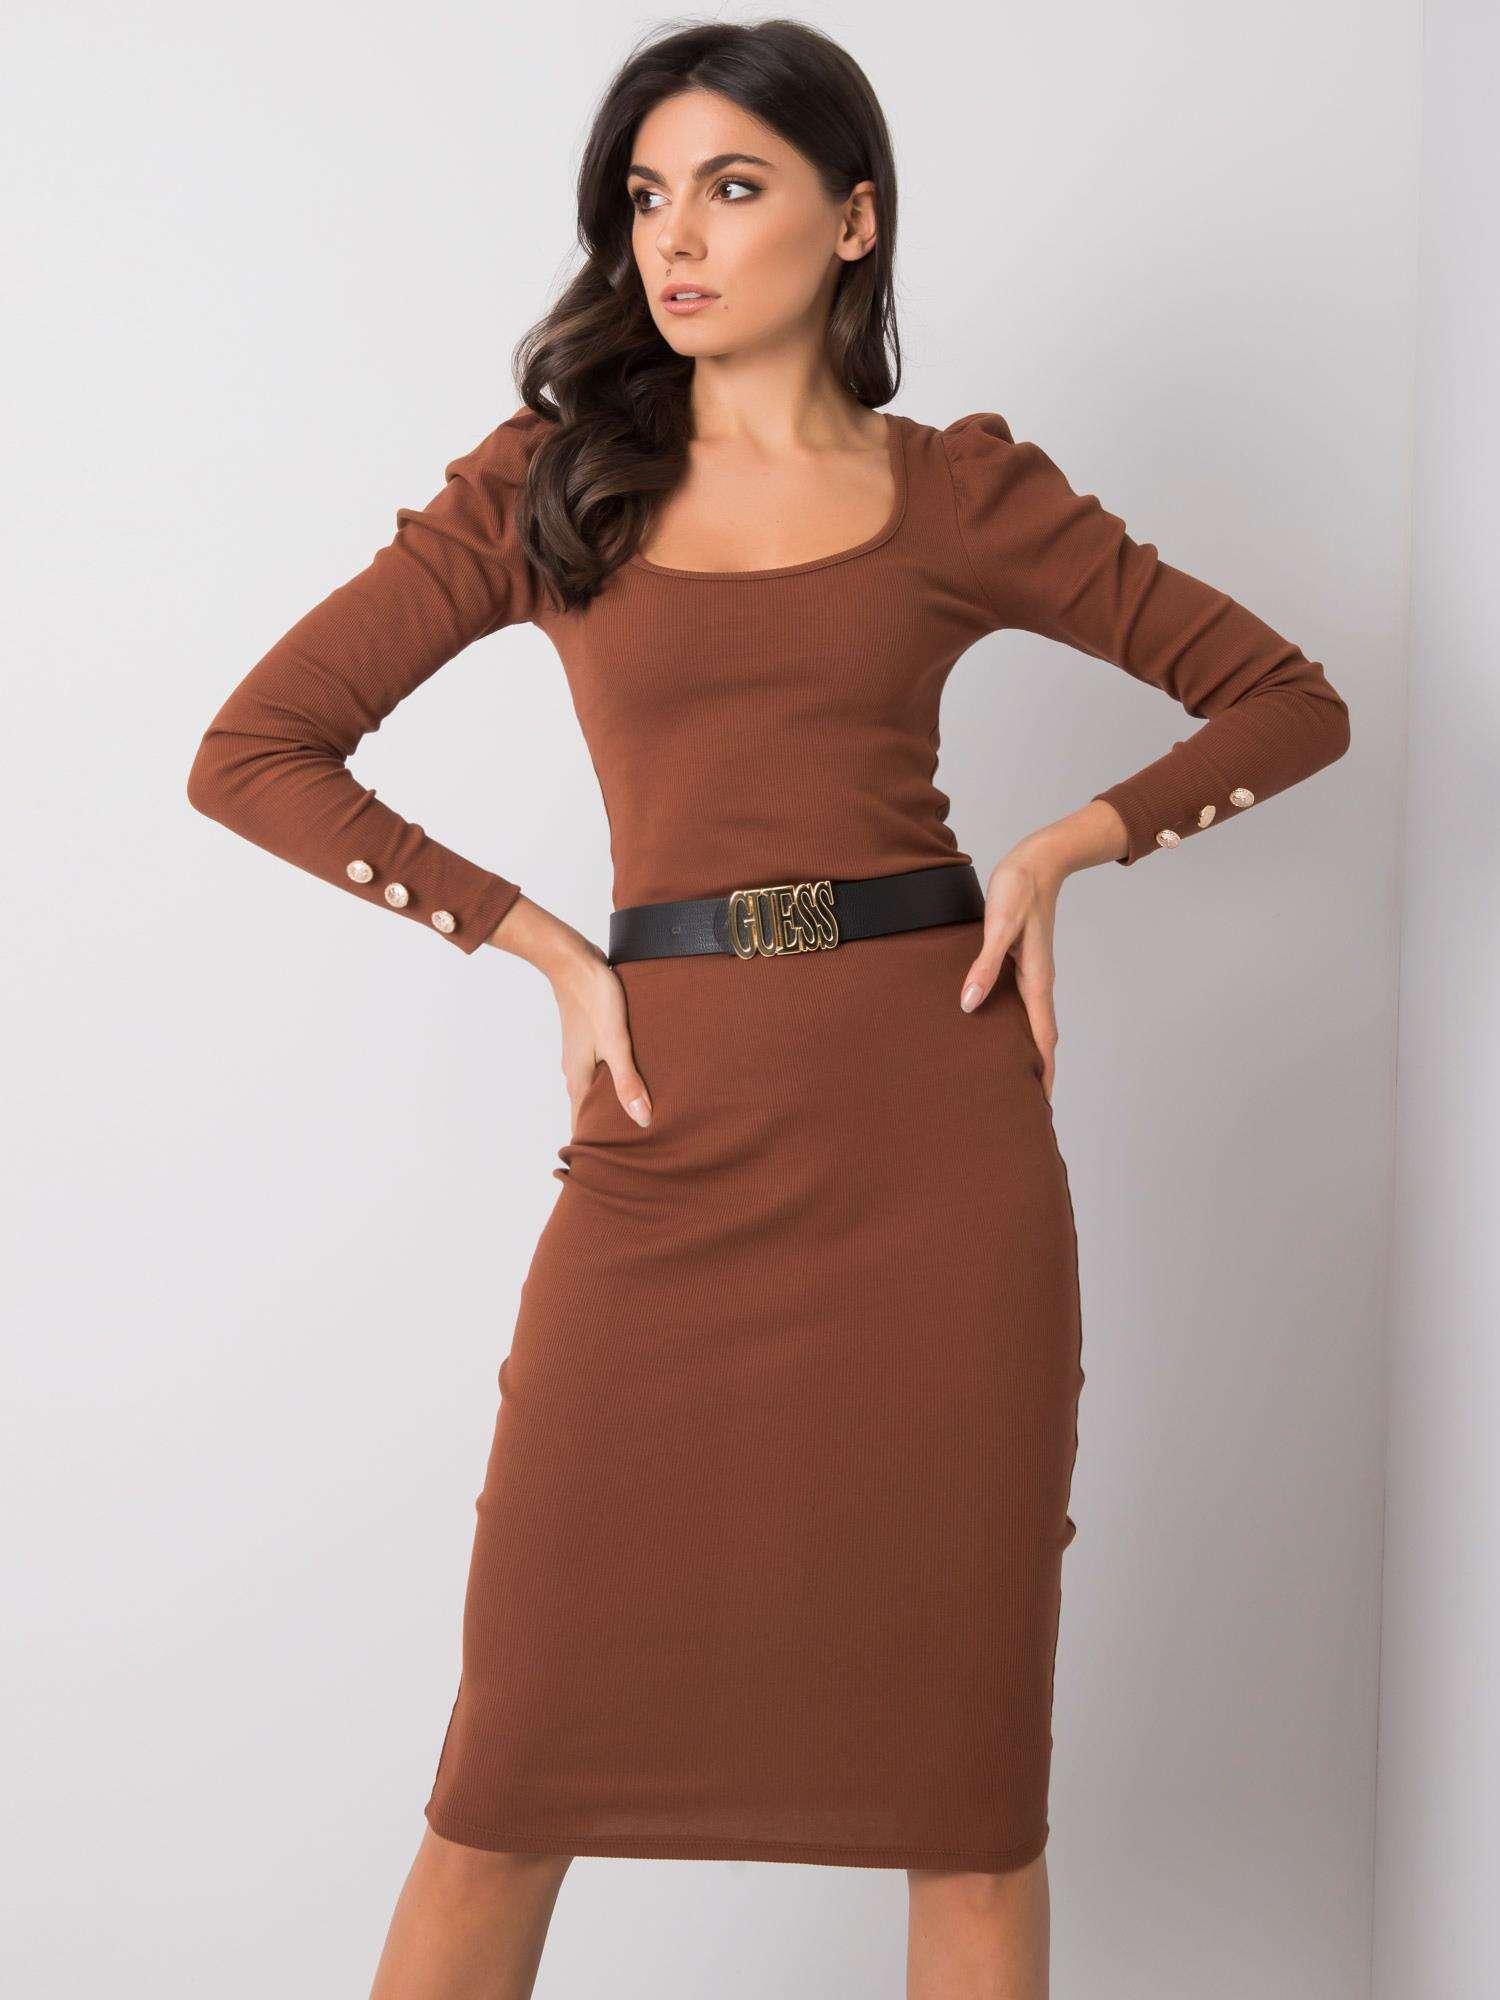 Hnědá dámská midi sukně RV-SD-R3740.04-brown Velikost: S/M